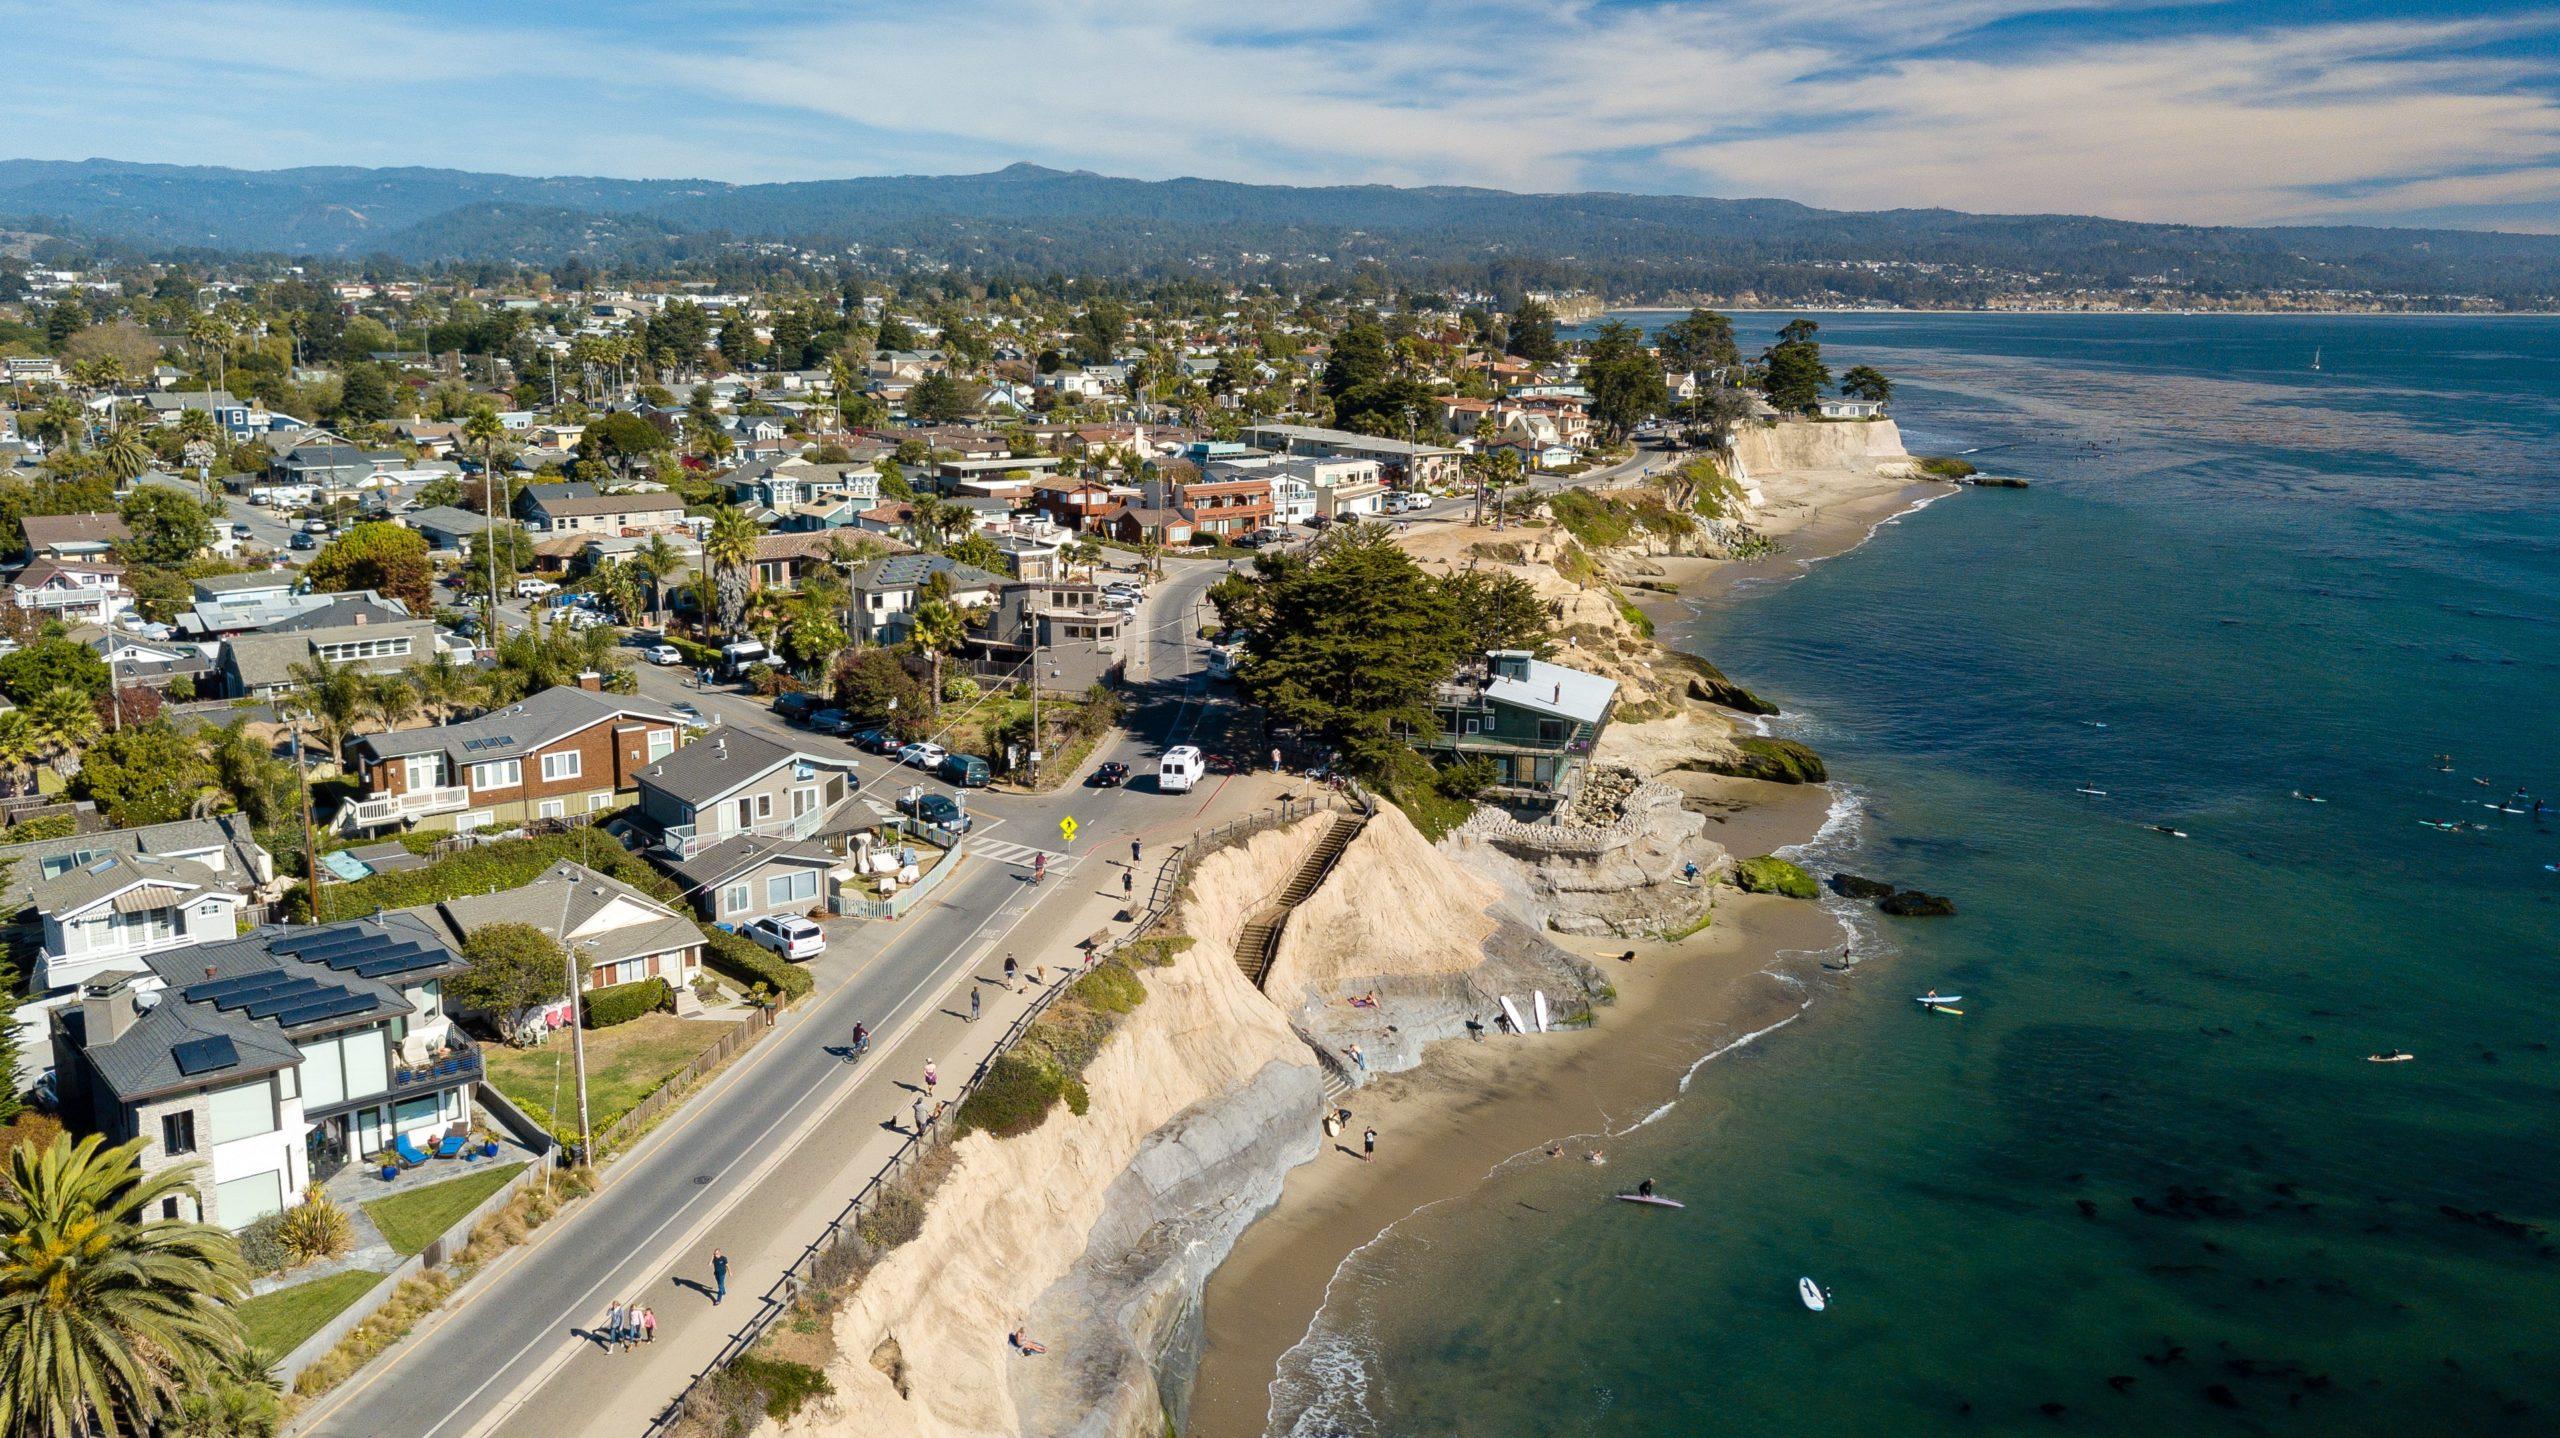 Surfing Santa Cruz - Pleasure Point